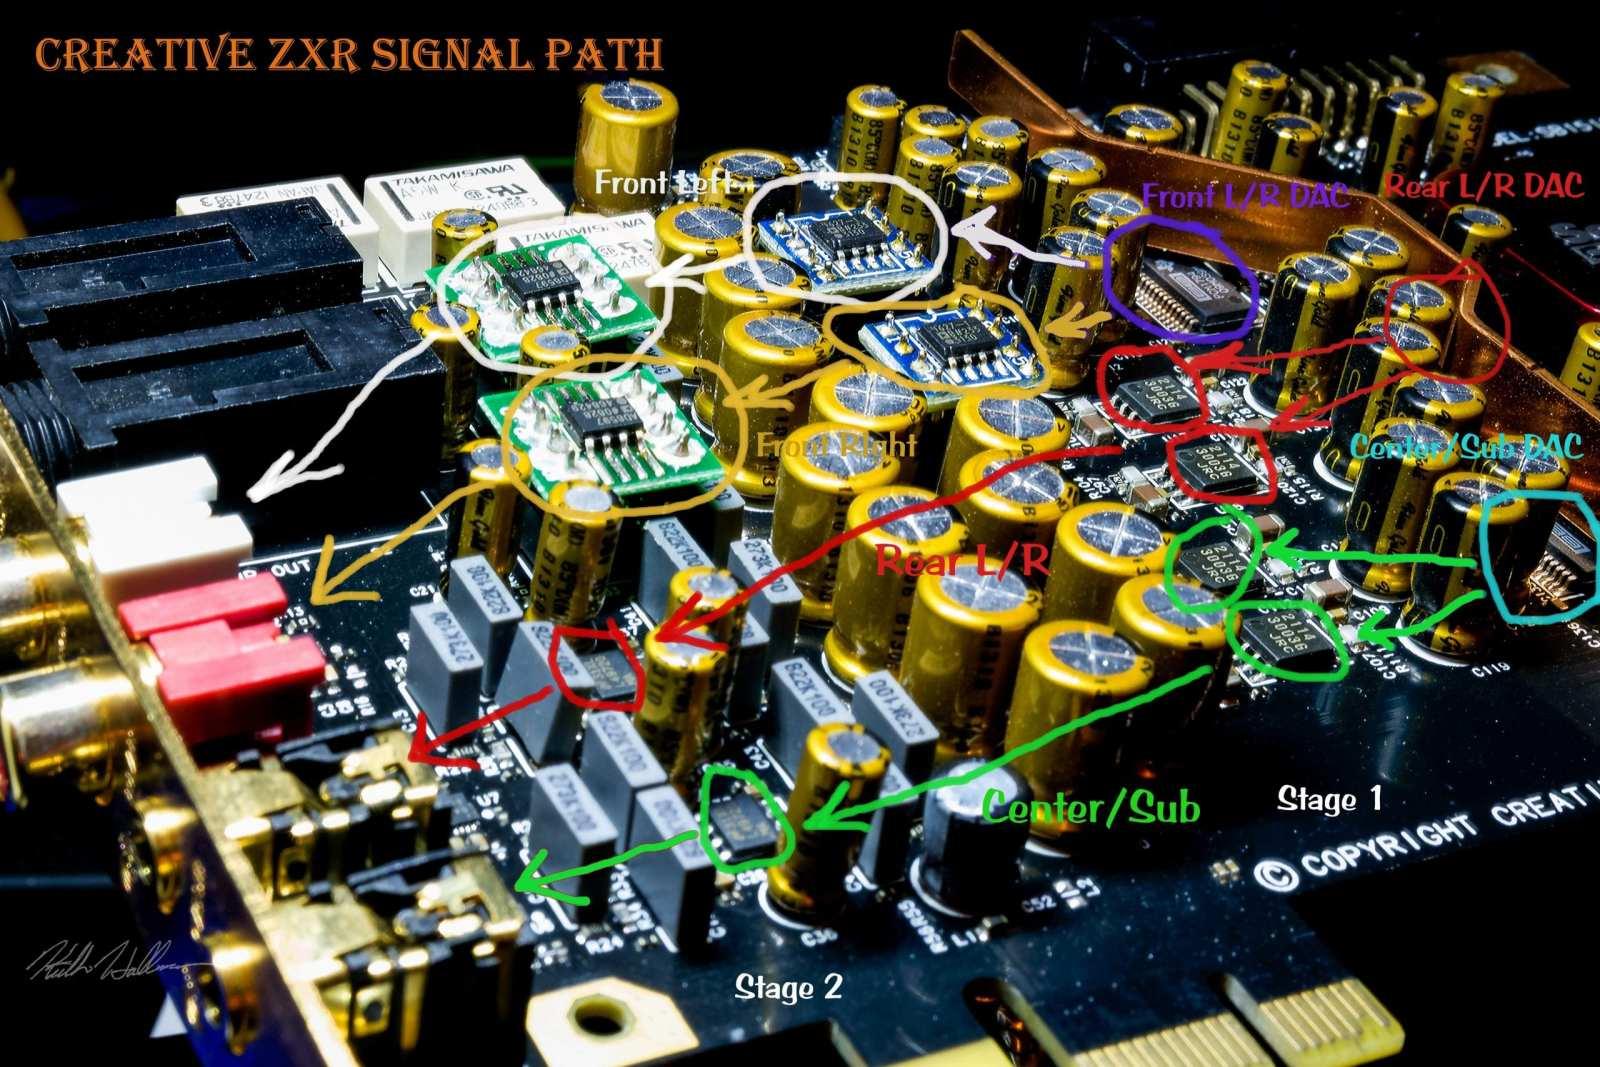 zxr-signal-path-diagram